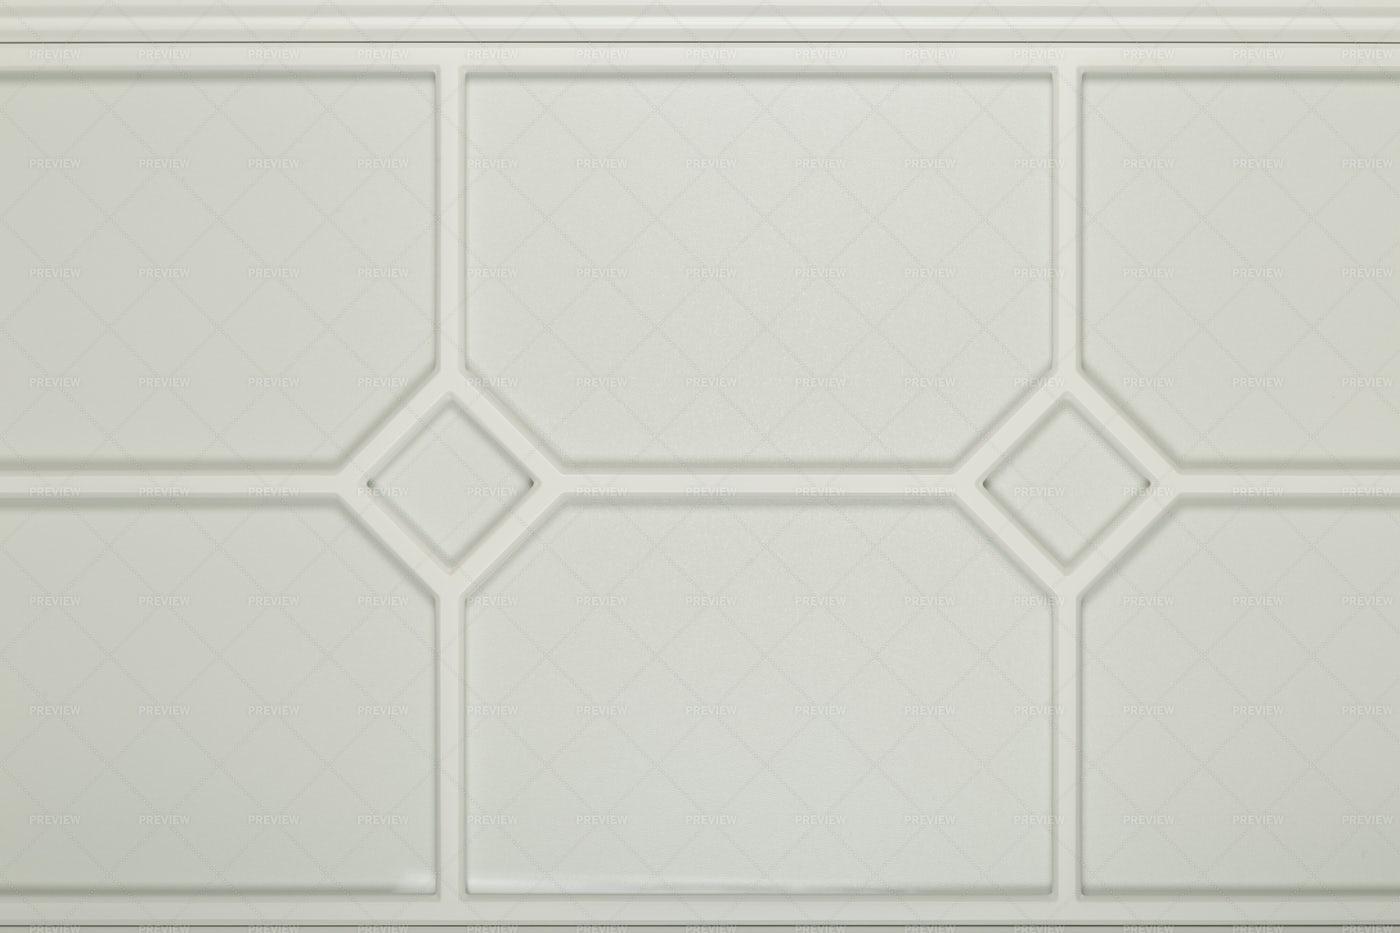 White Kitchen Facade: Stock Photos